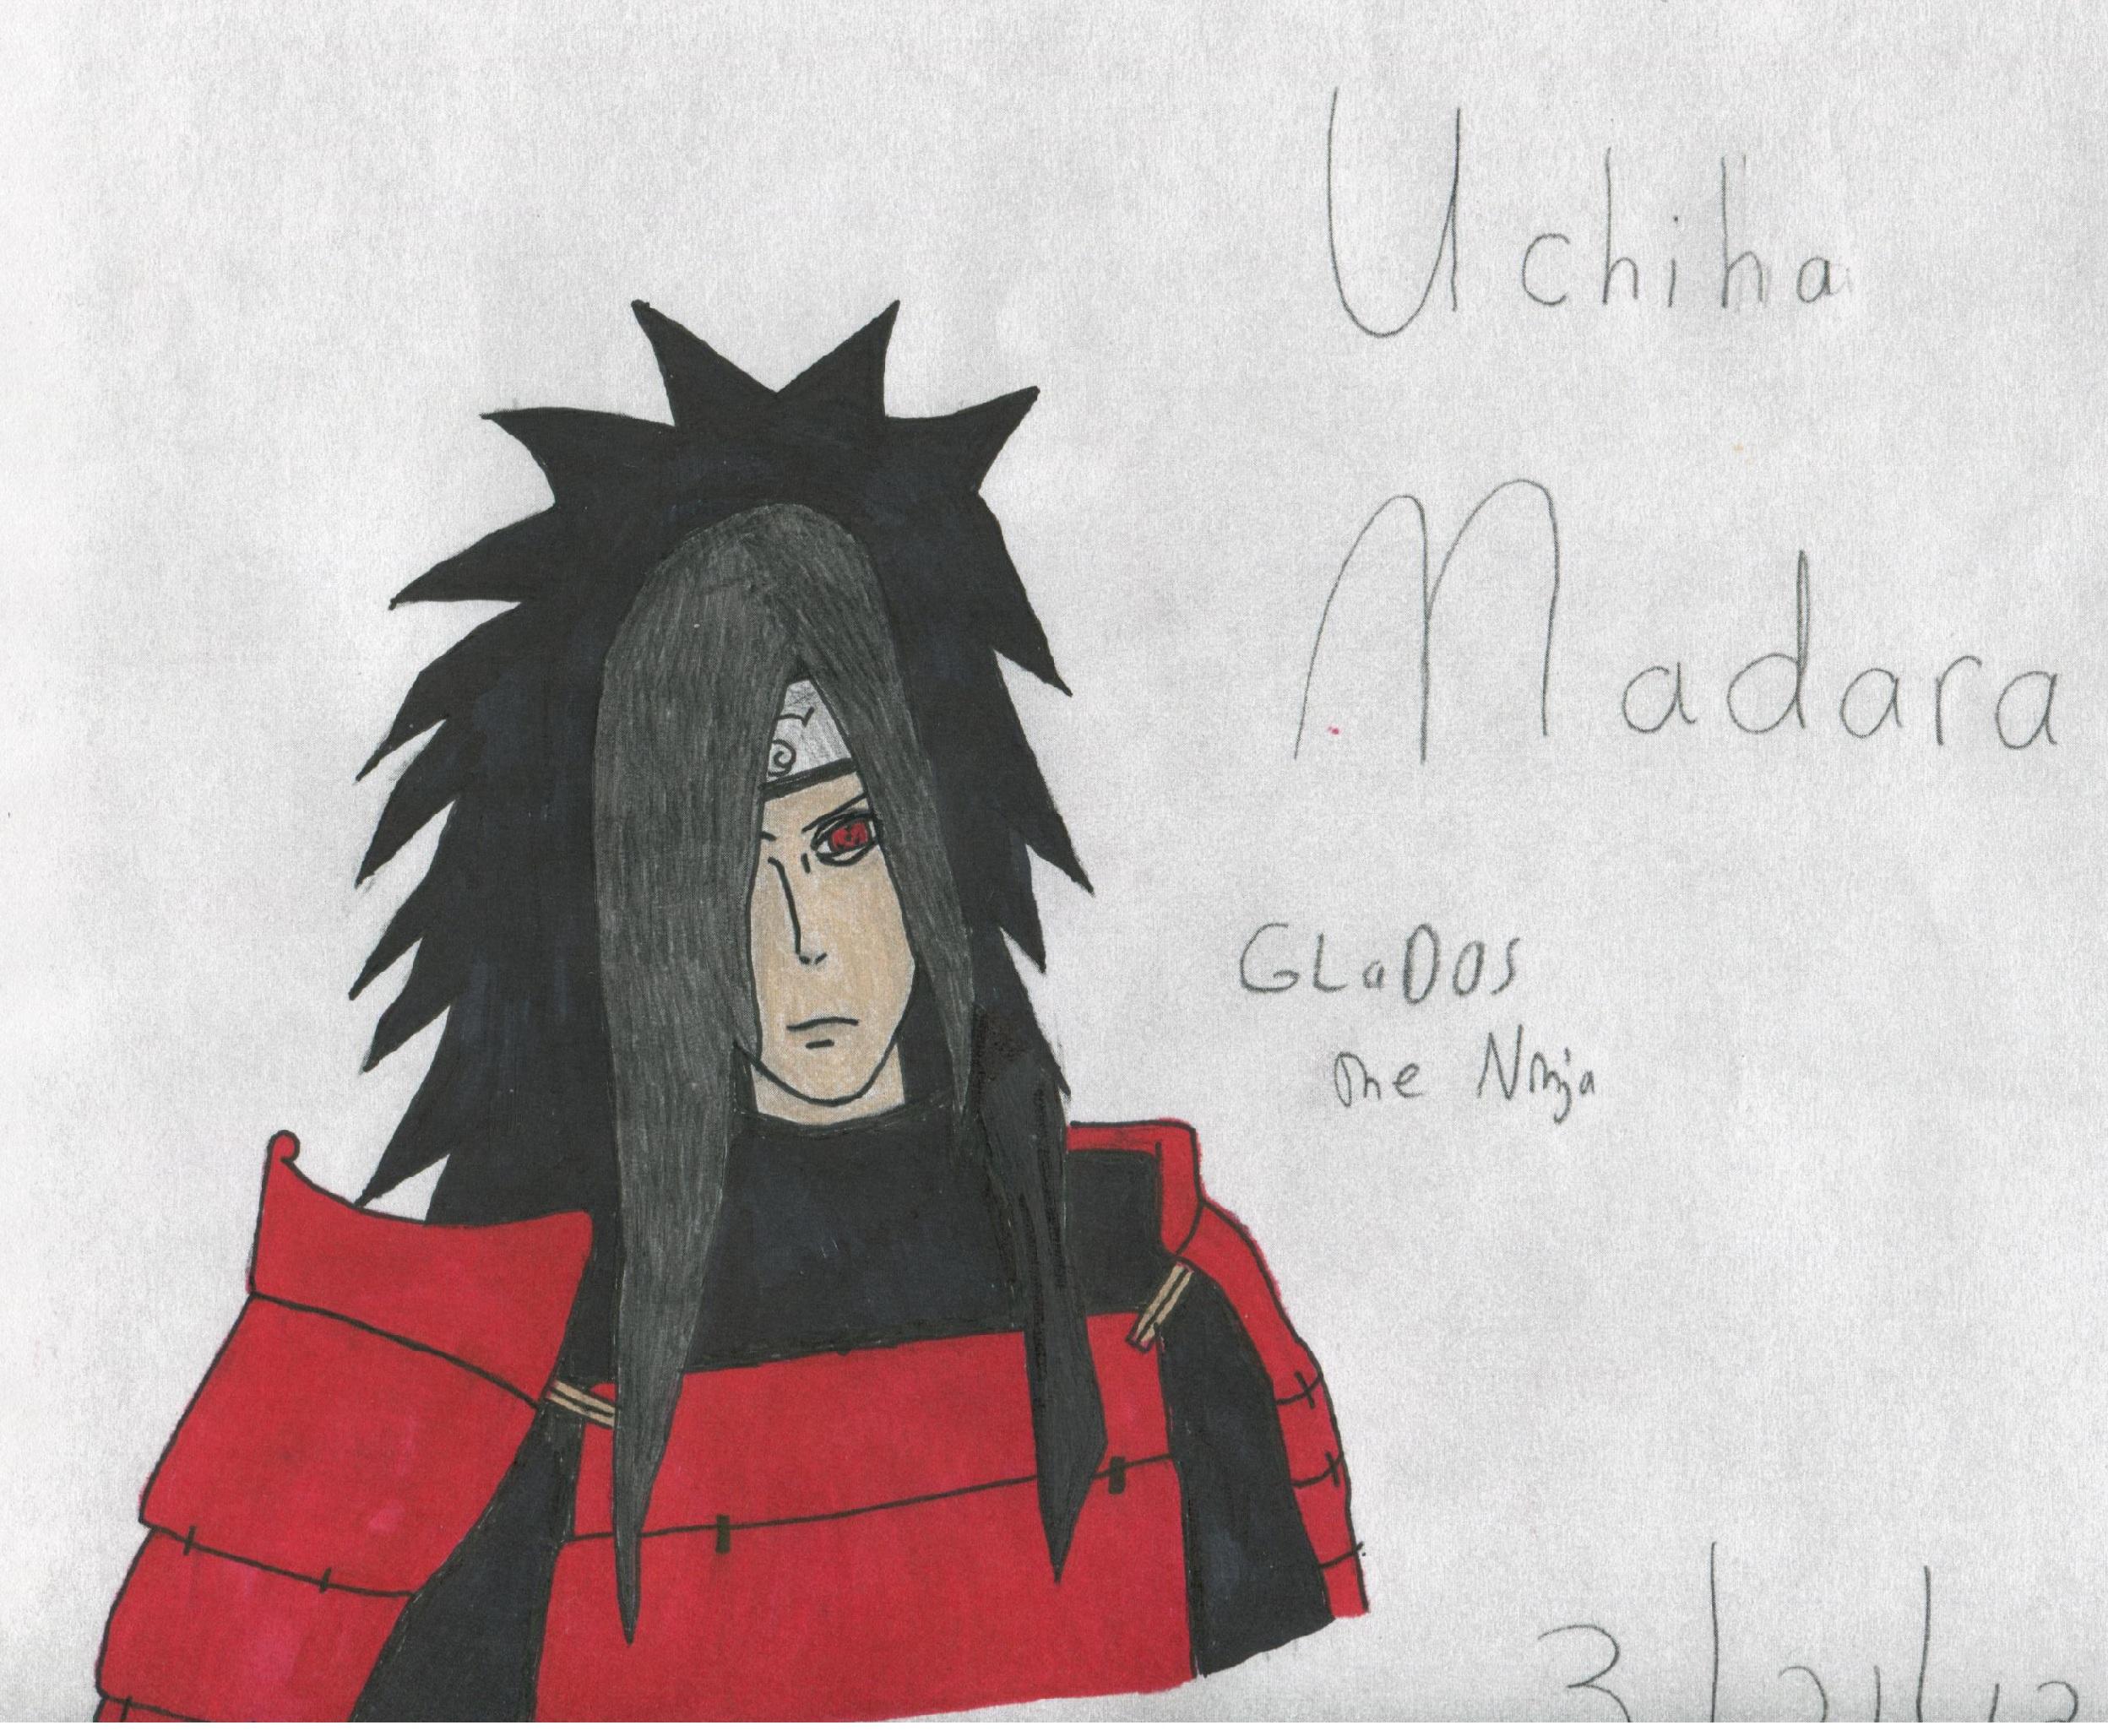 Uchiha Madara by PlethoraFantastique